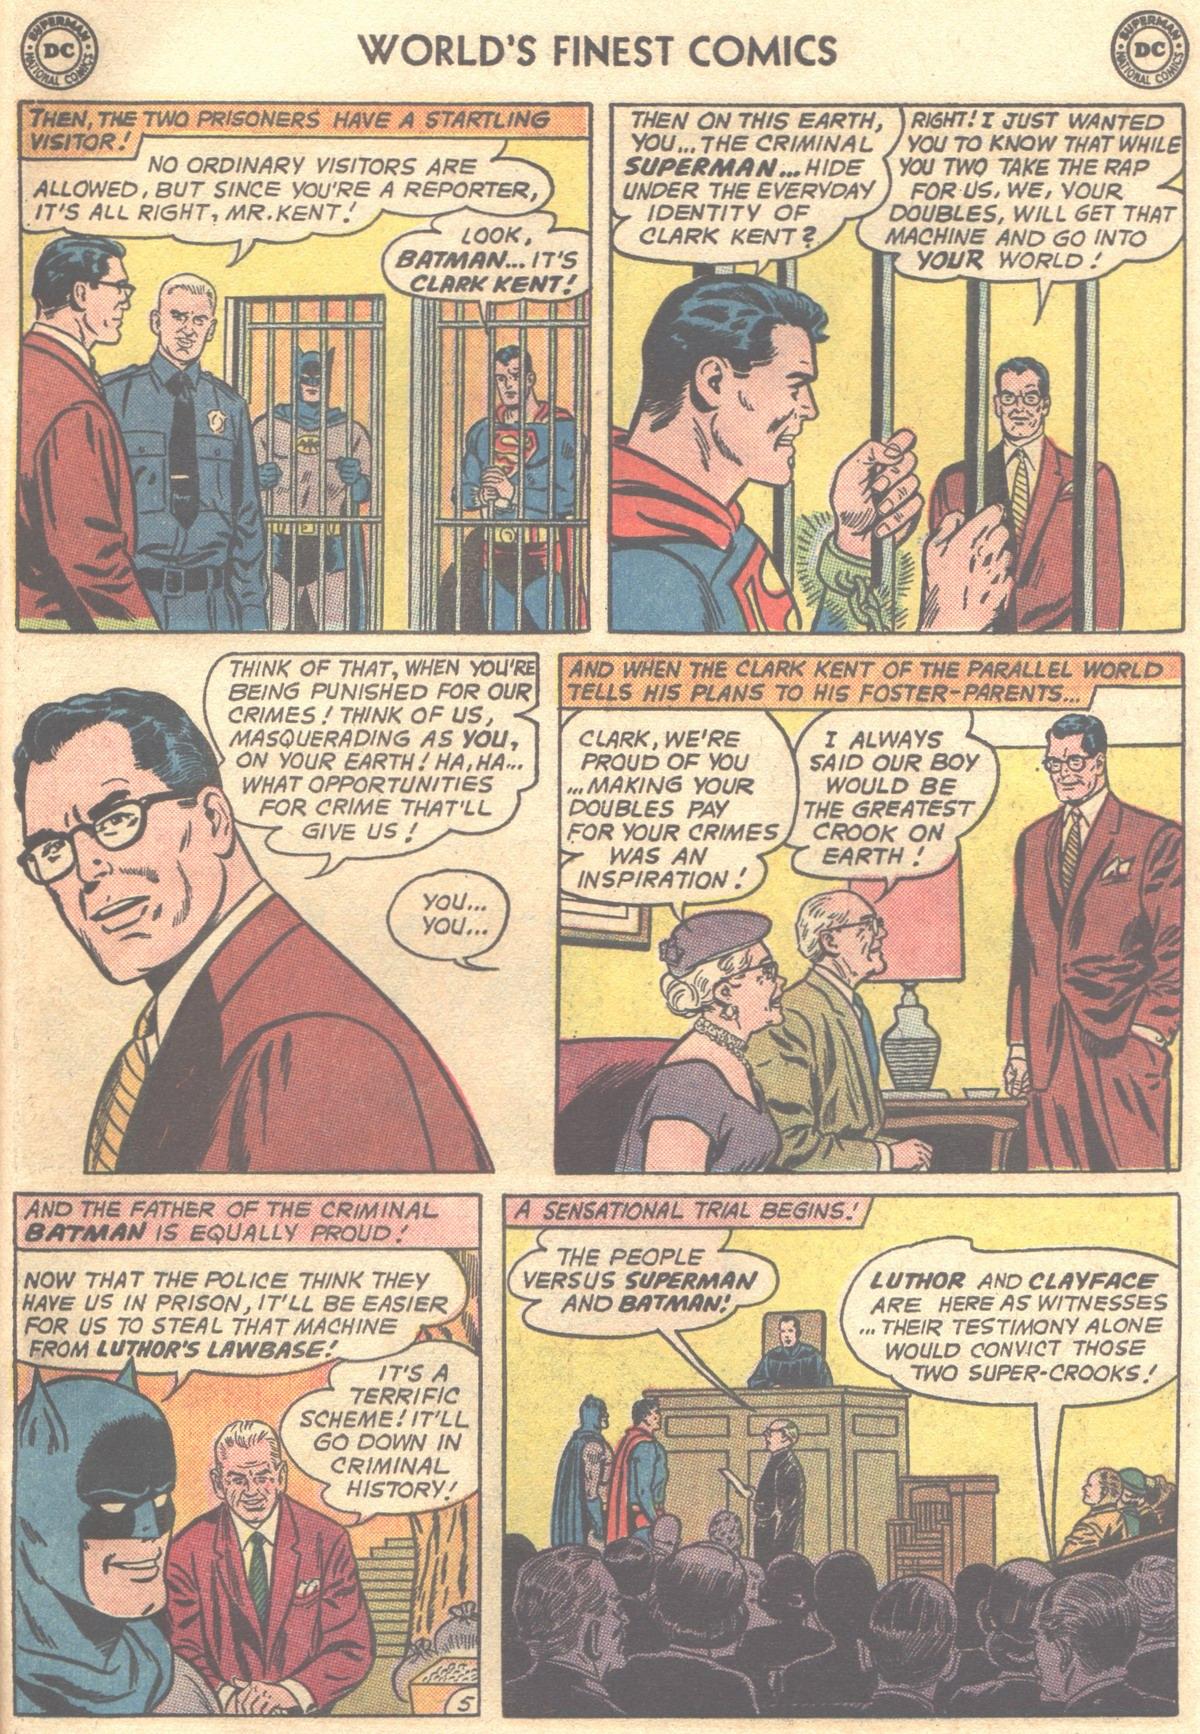 Read online World's Finest Comics comic -  Issue #148 - 17